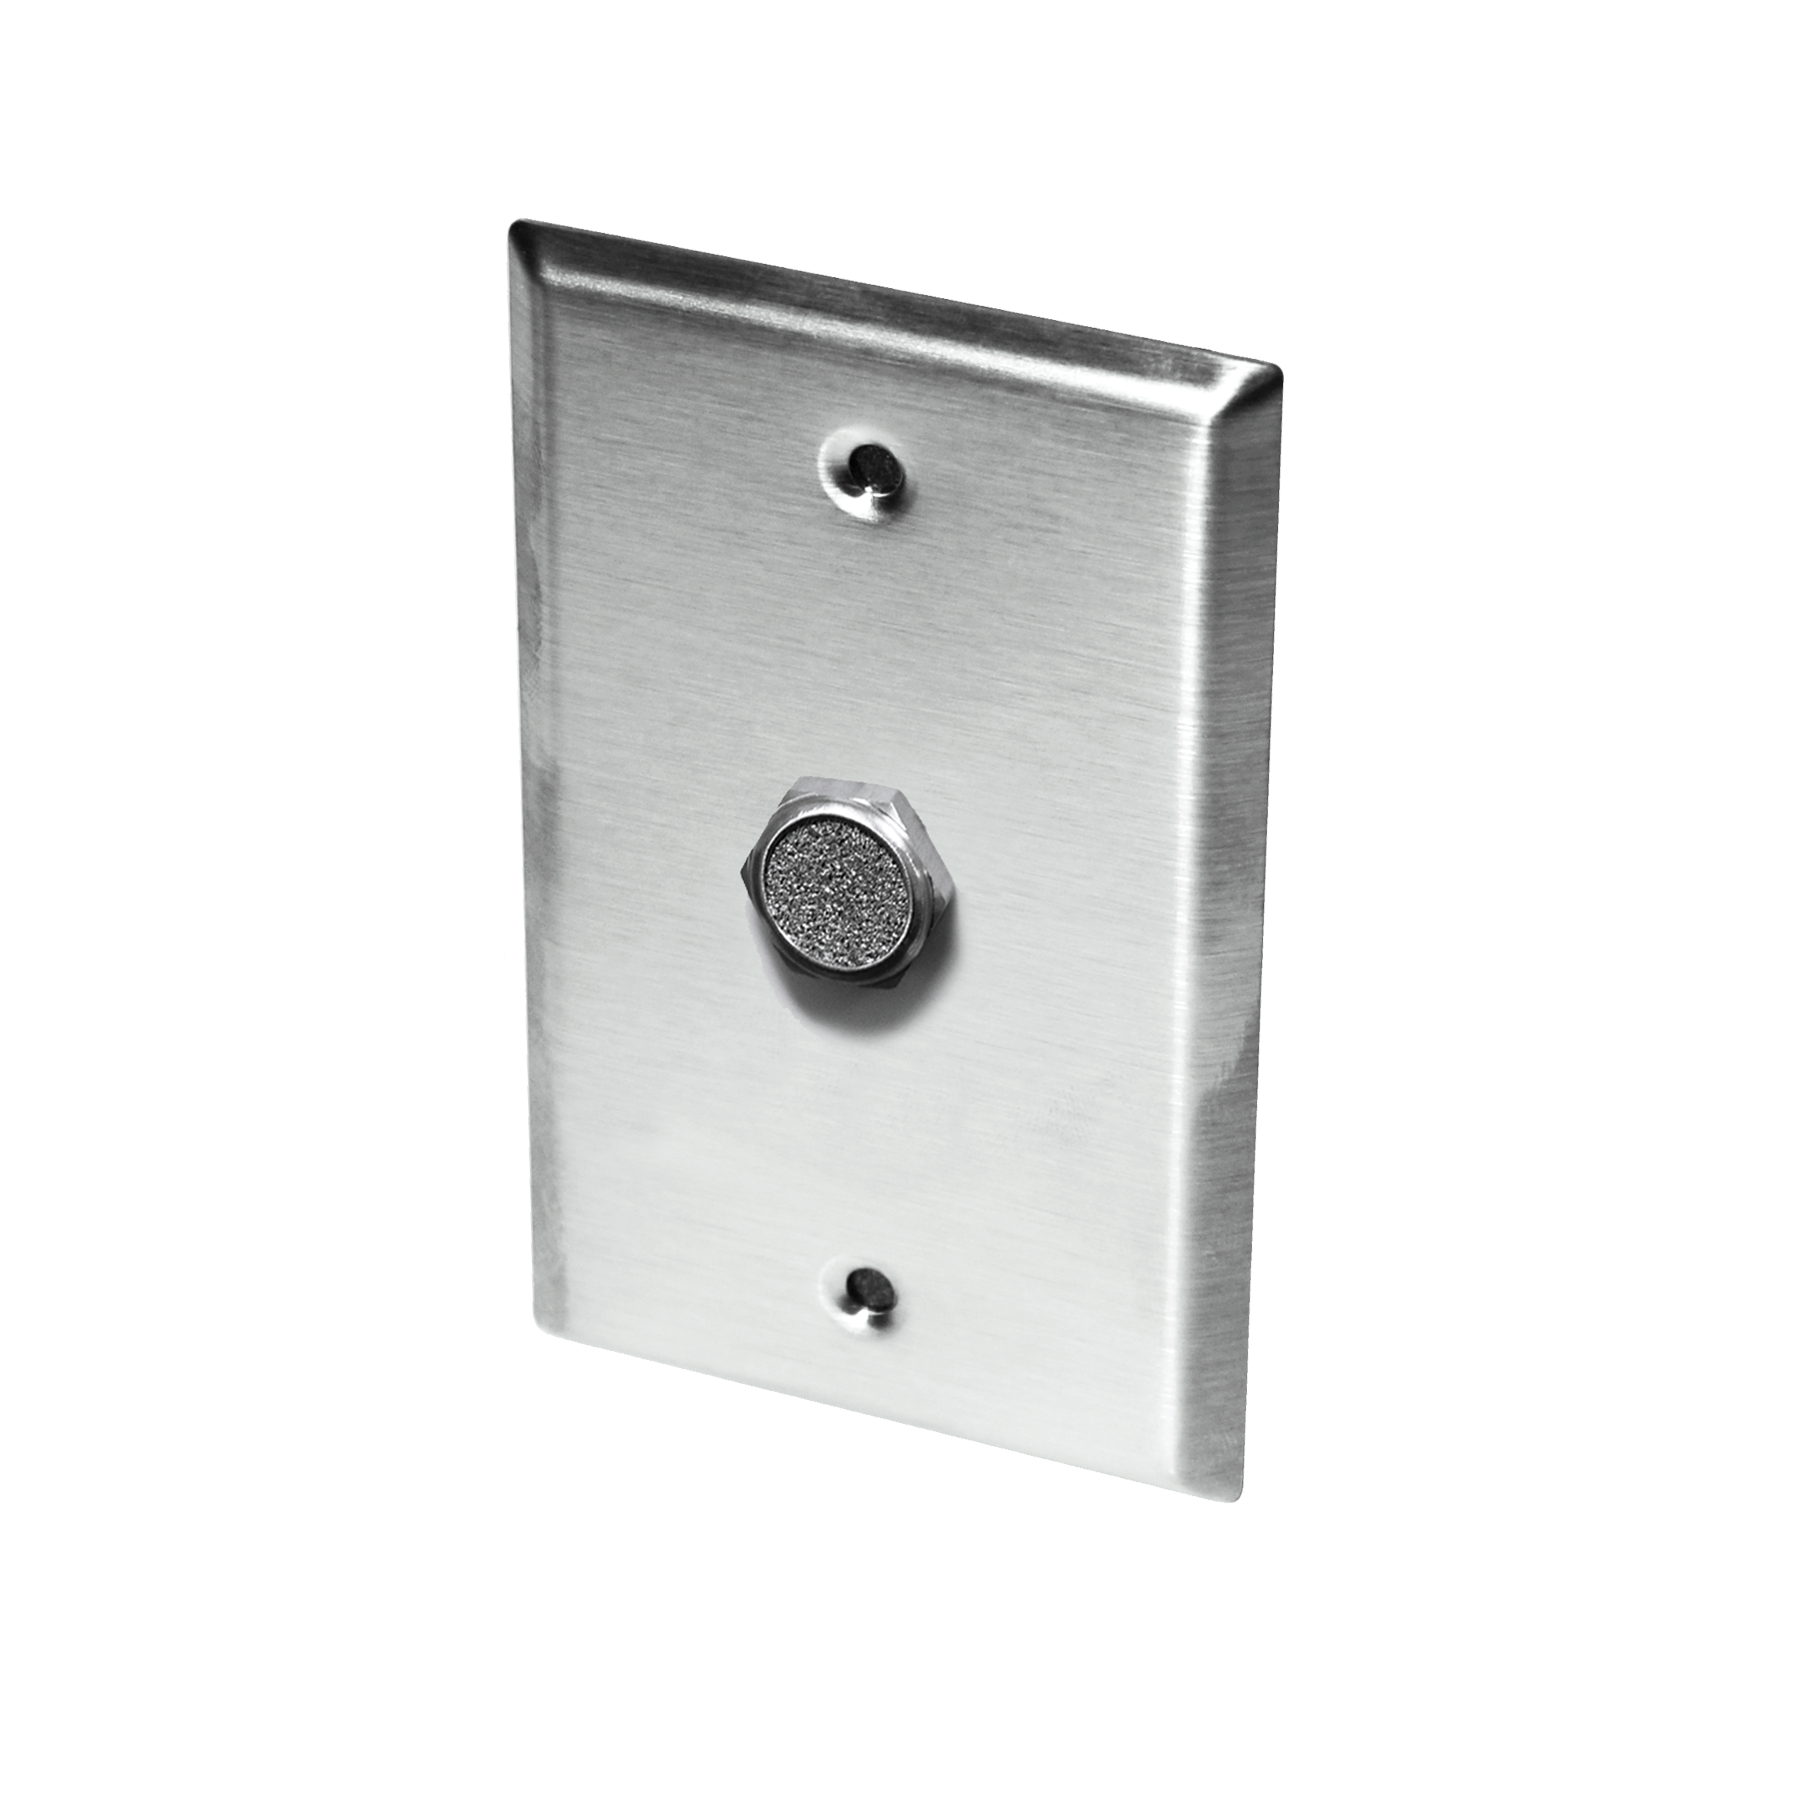 ACI A/SP-PUP Pickup Port for Sensing Additional Reference Pressures